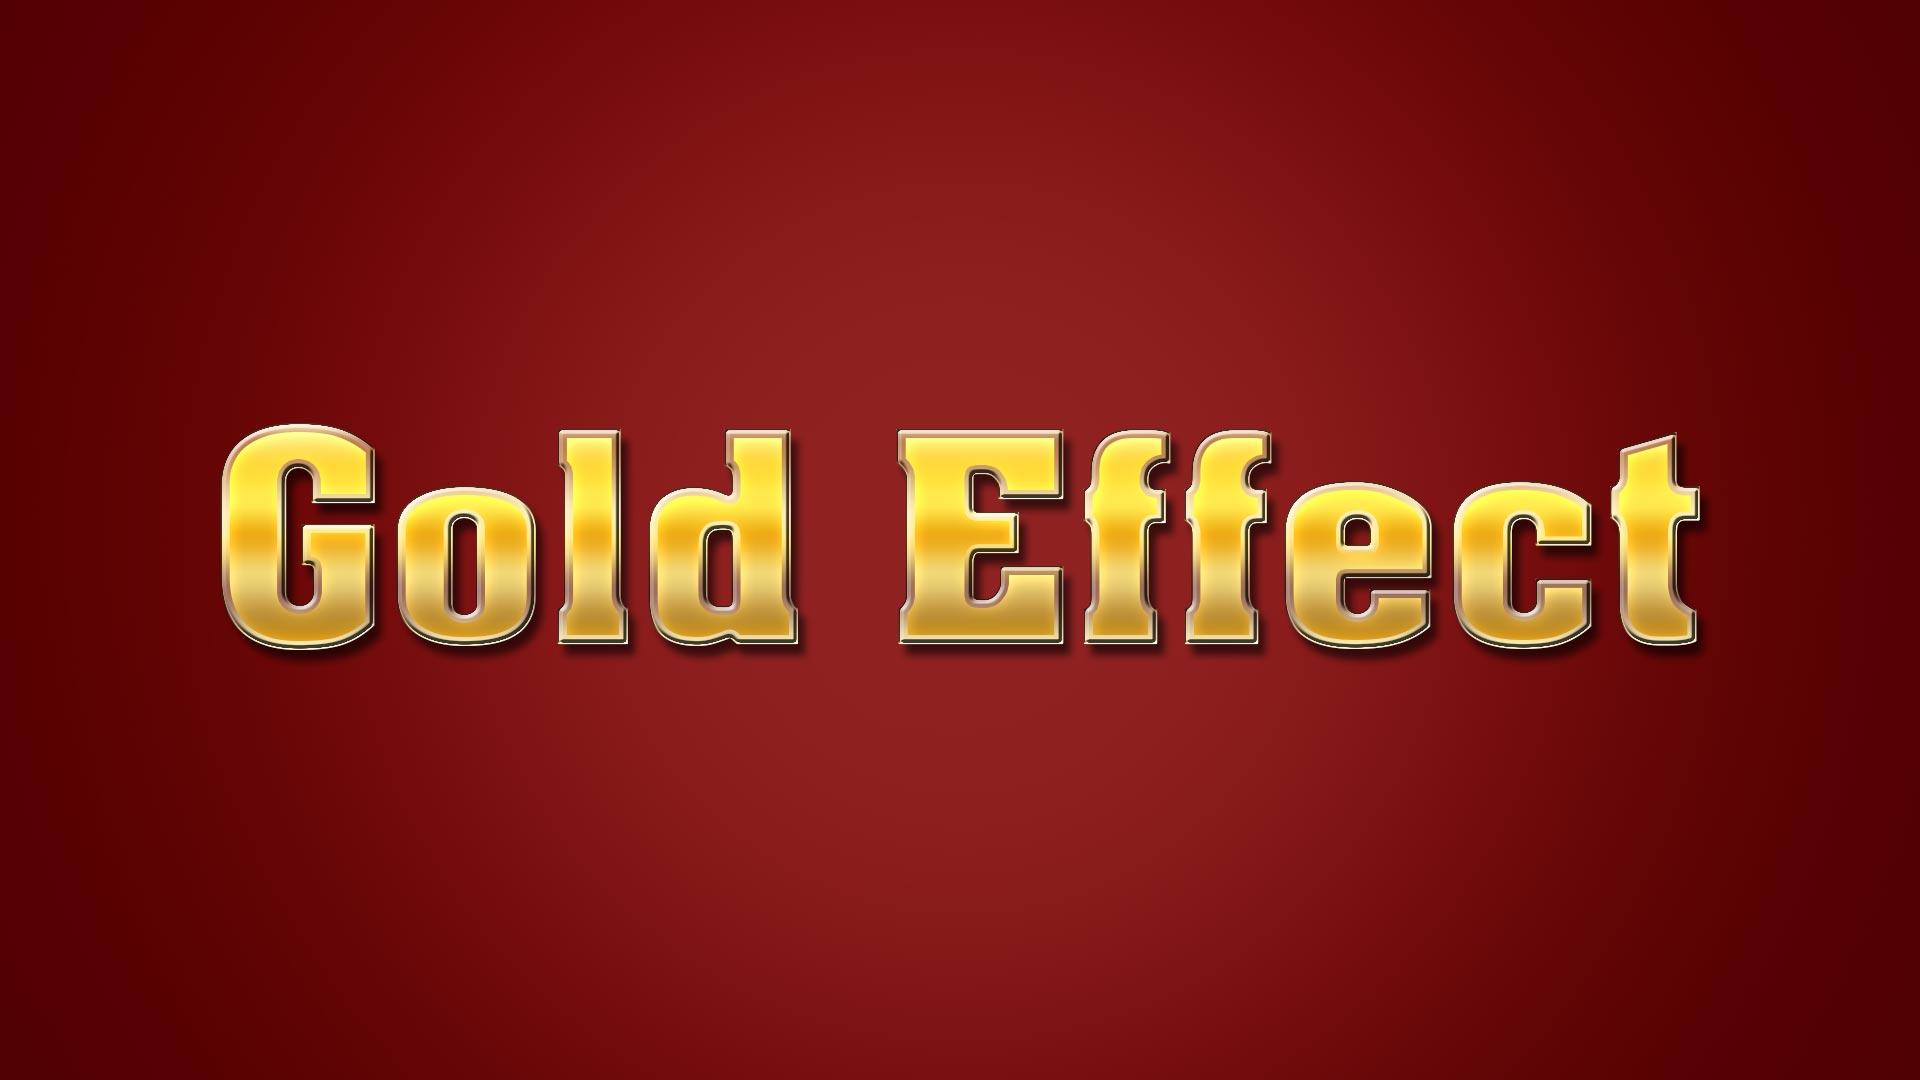 Psd Sun Effect Gold Effectr Psd File